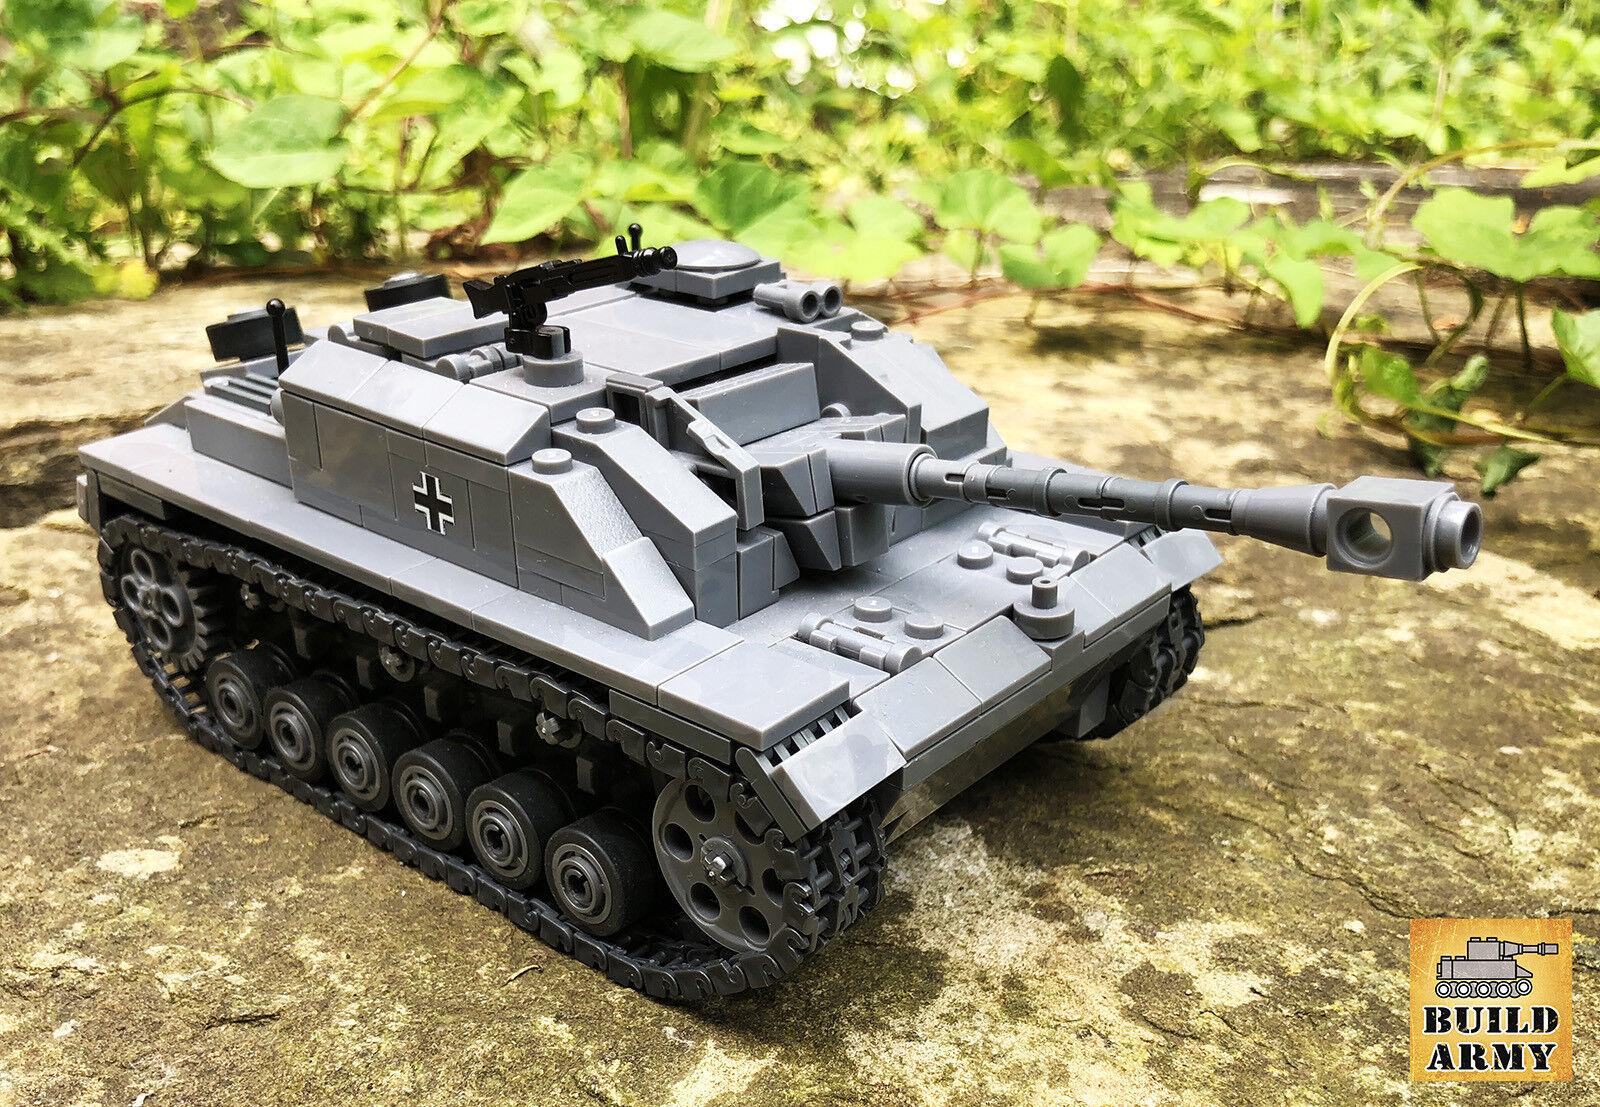 WW2 StuG tank MOC brick set + building instruction made by lego digital designer